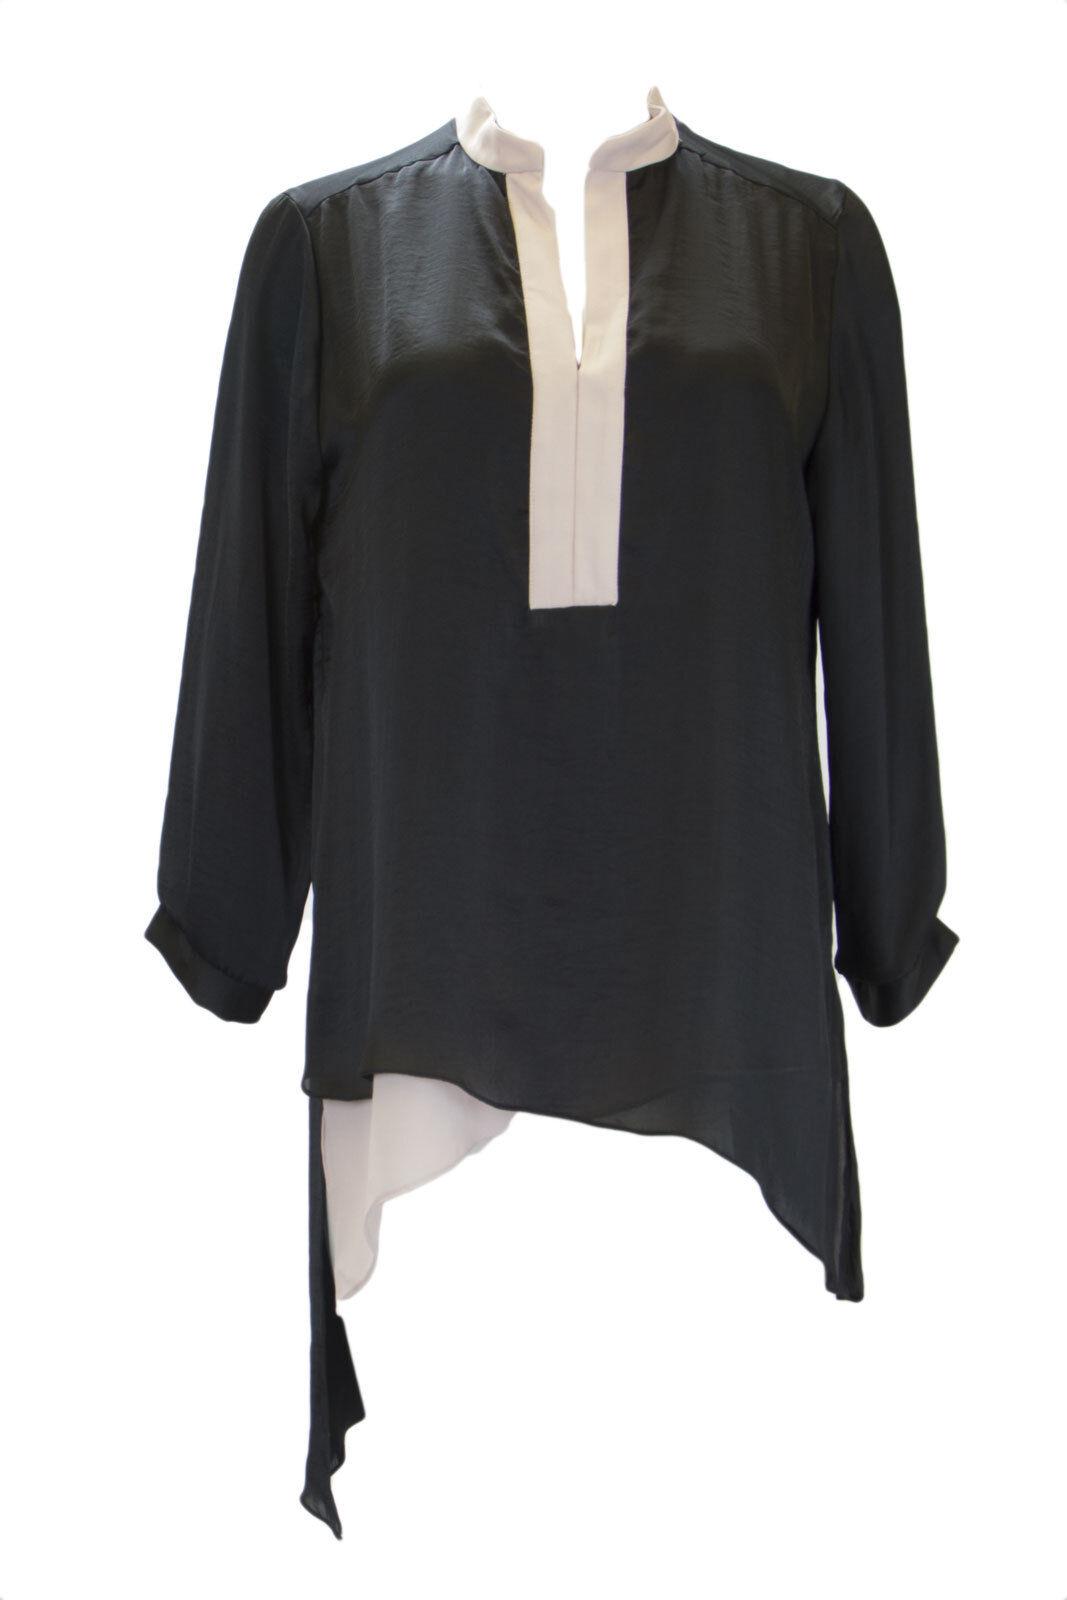 Atina Cristina Woherren schwarz Asymmetric Hem Layerot Blouse T3877CD17  NWT